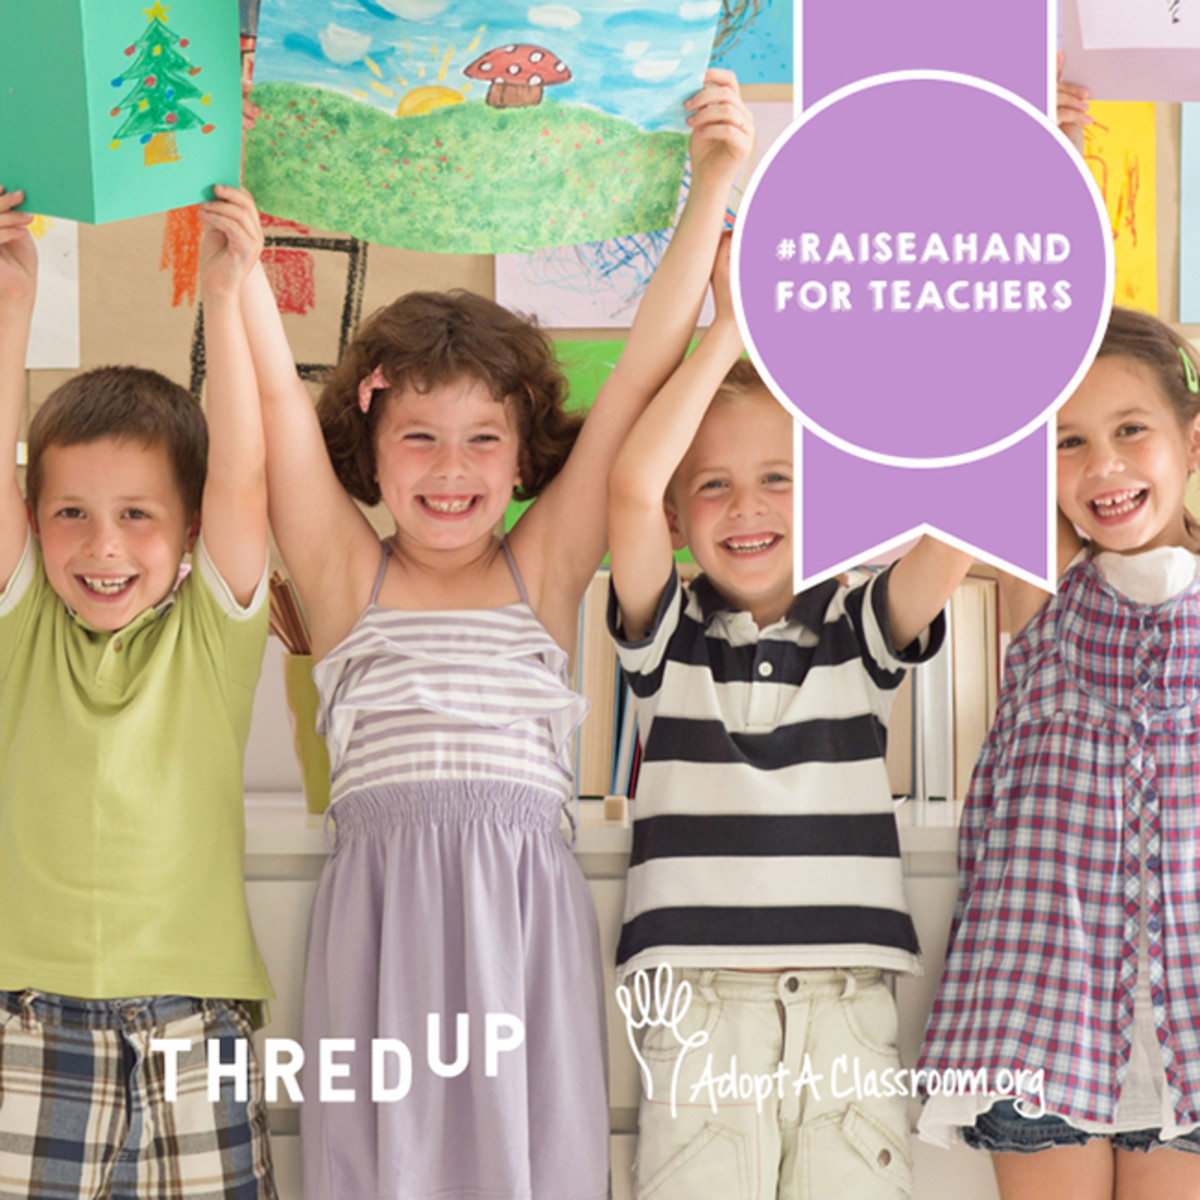 thredup raise a hand for teachers